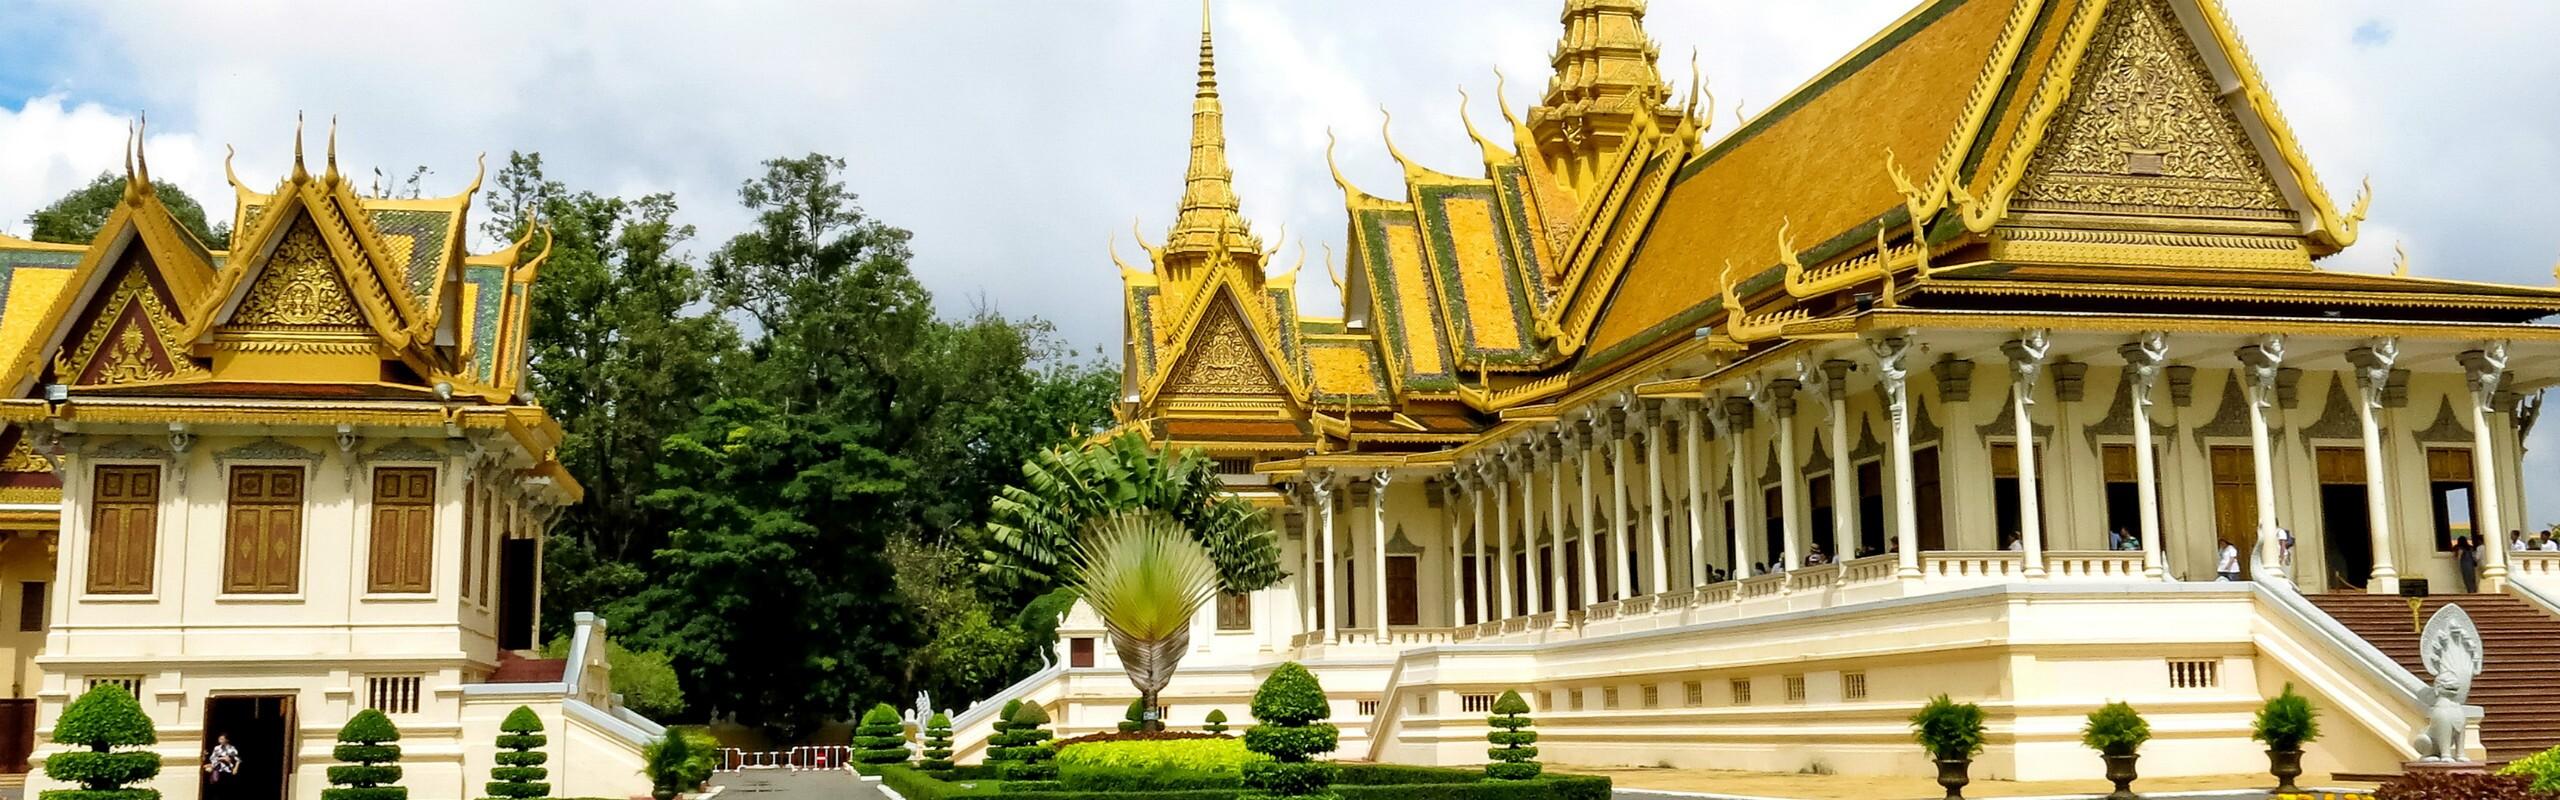 How to Get to Phnom Penh